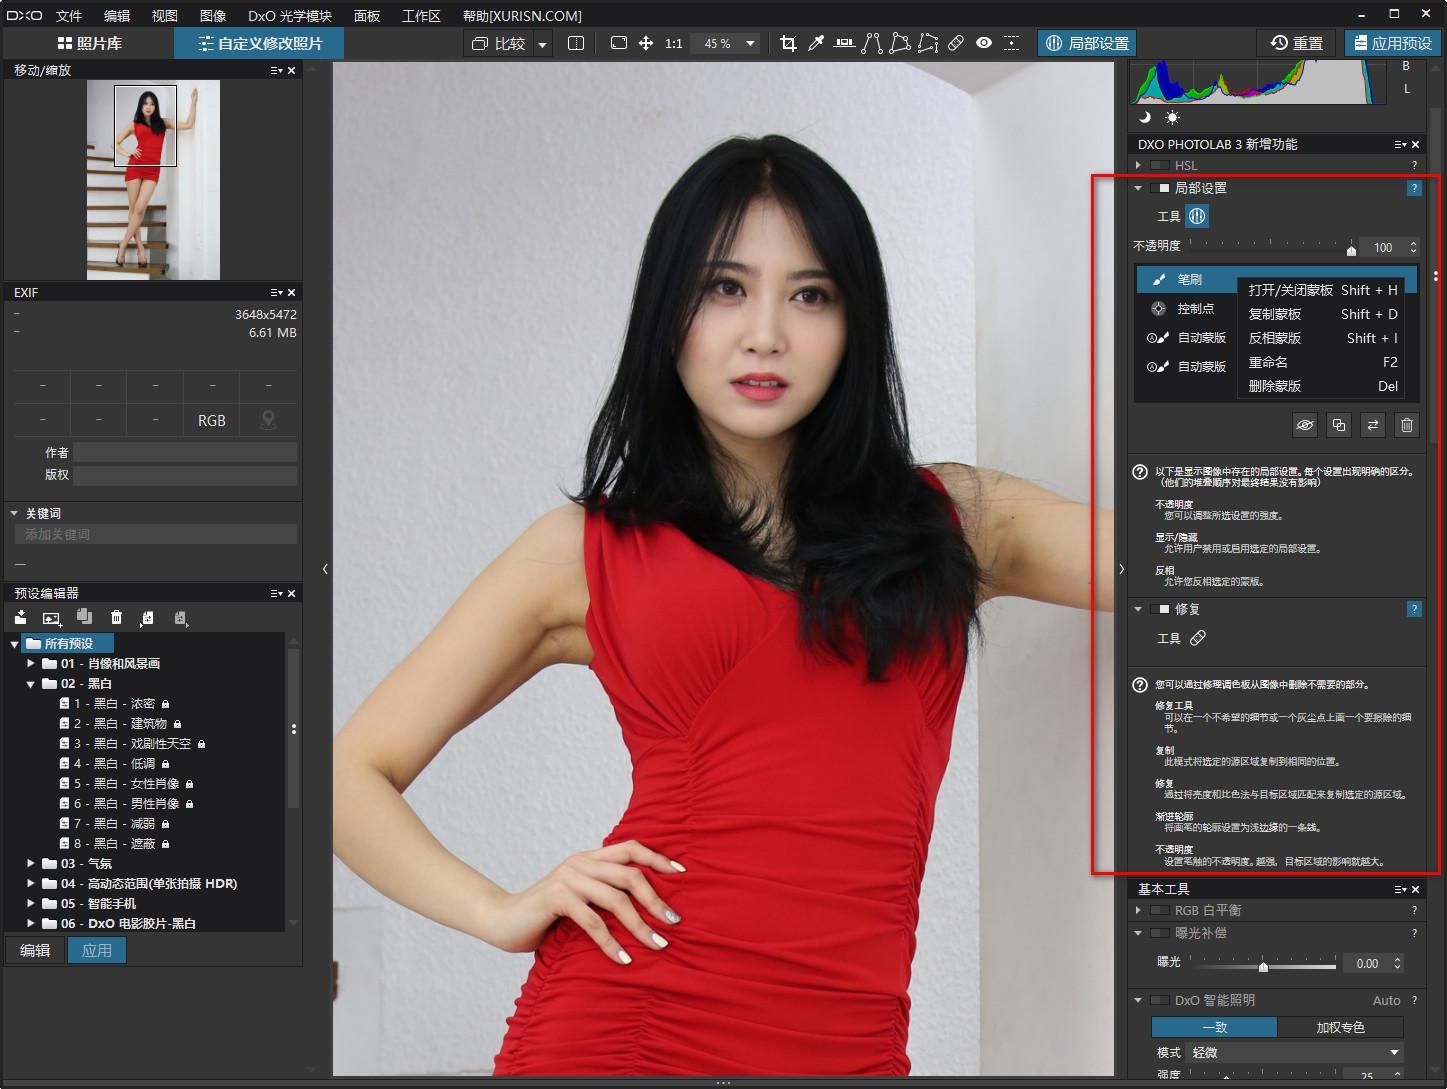 VIP资源-照片后期处理软件DxO PhotoLab 3.3.0 Build 4391 中文汉化版(16)